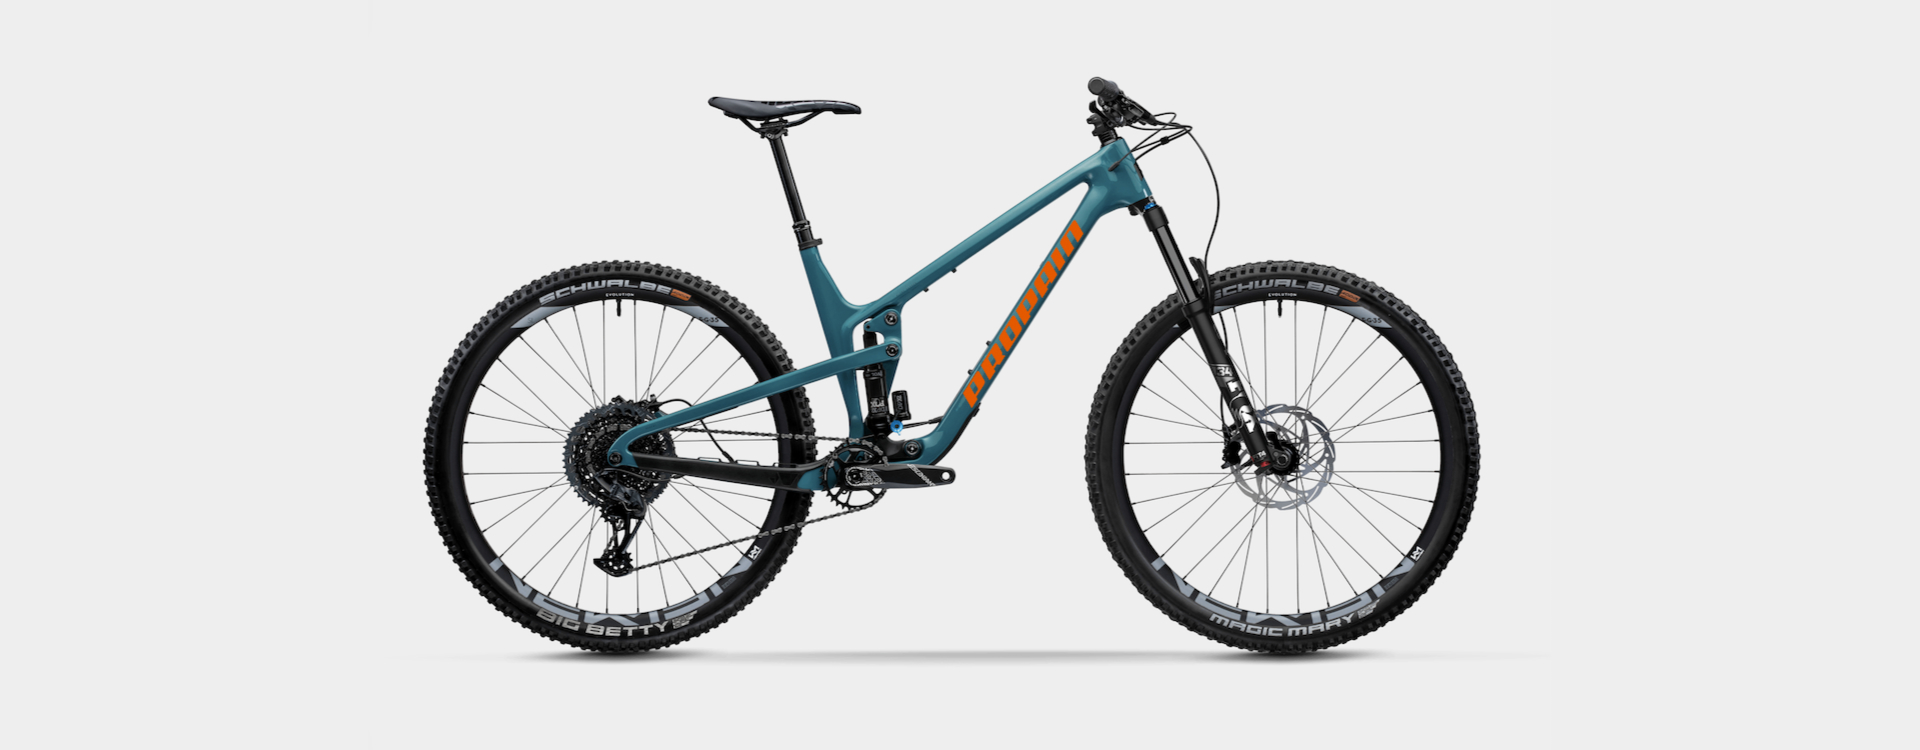 Bike Verleih Gummersbach Propain Bikes Testcenter NRW Hugene 1 - CF - S - Petrol - 1920x750px